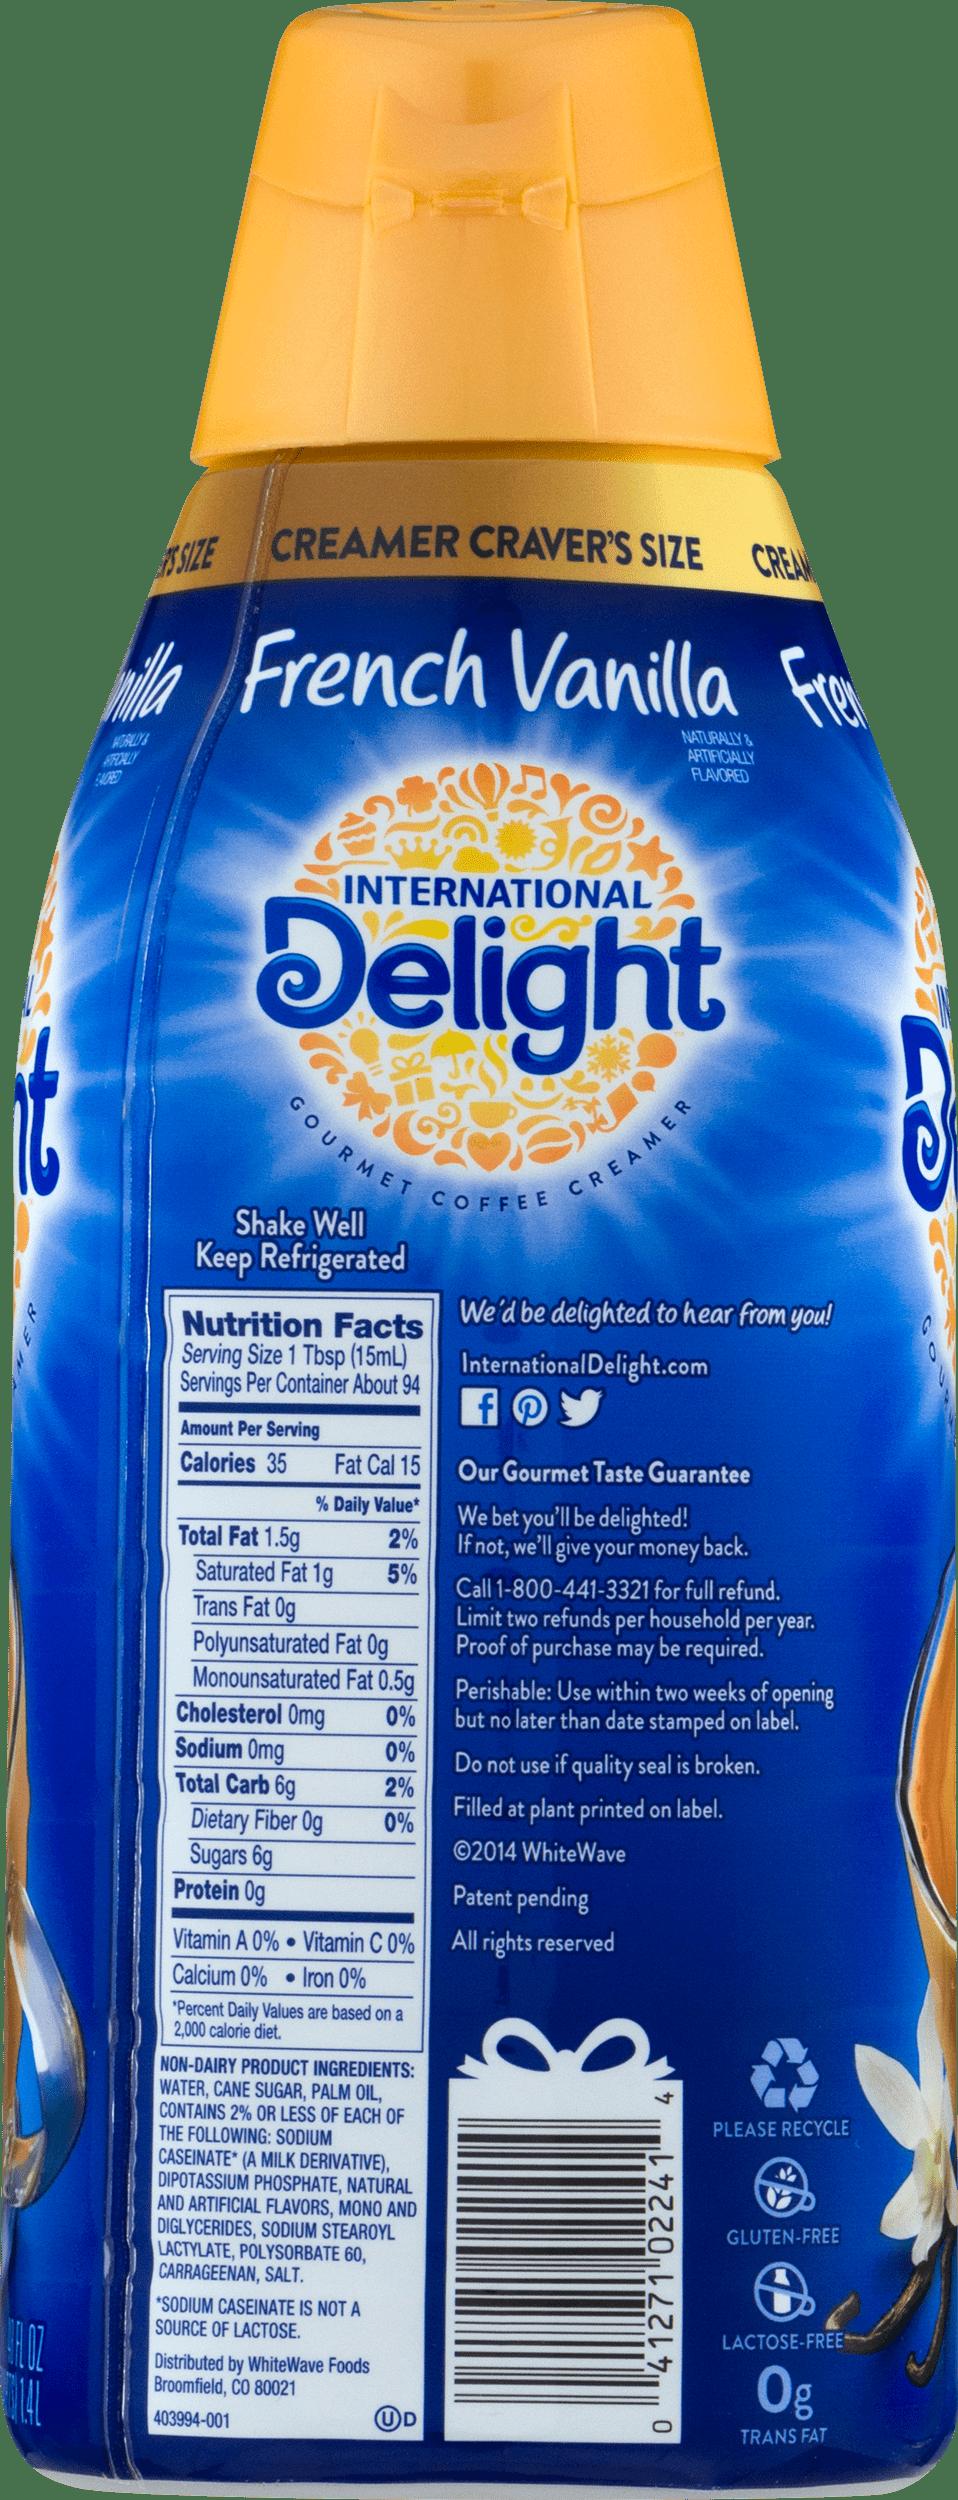 international delight creamer ingredients